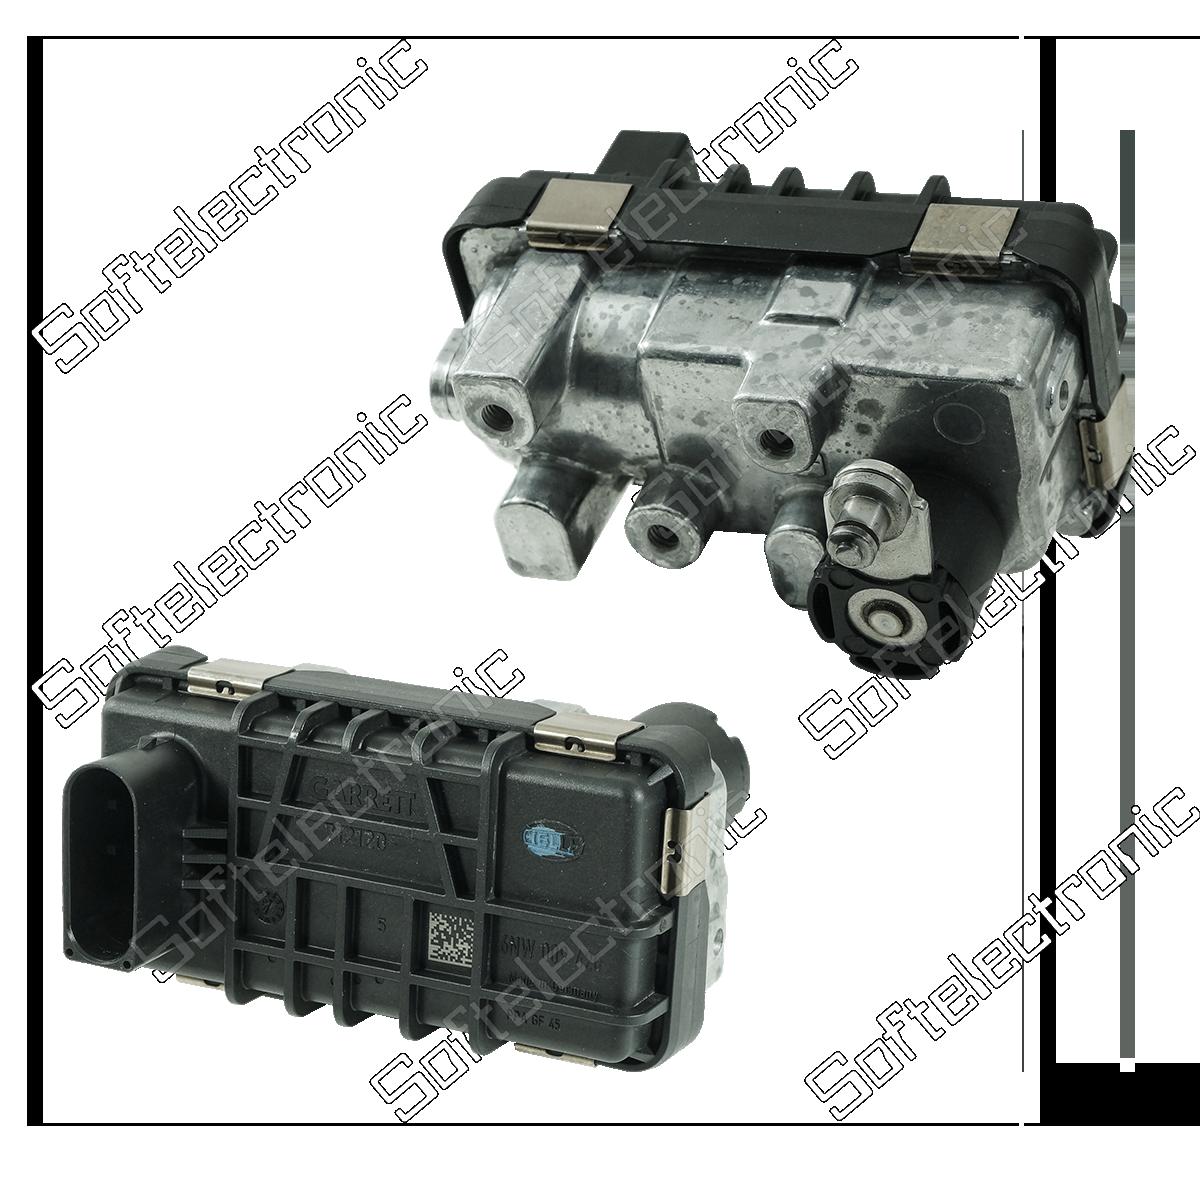 turbocharger actuator, Electronic turbocharger